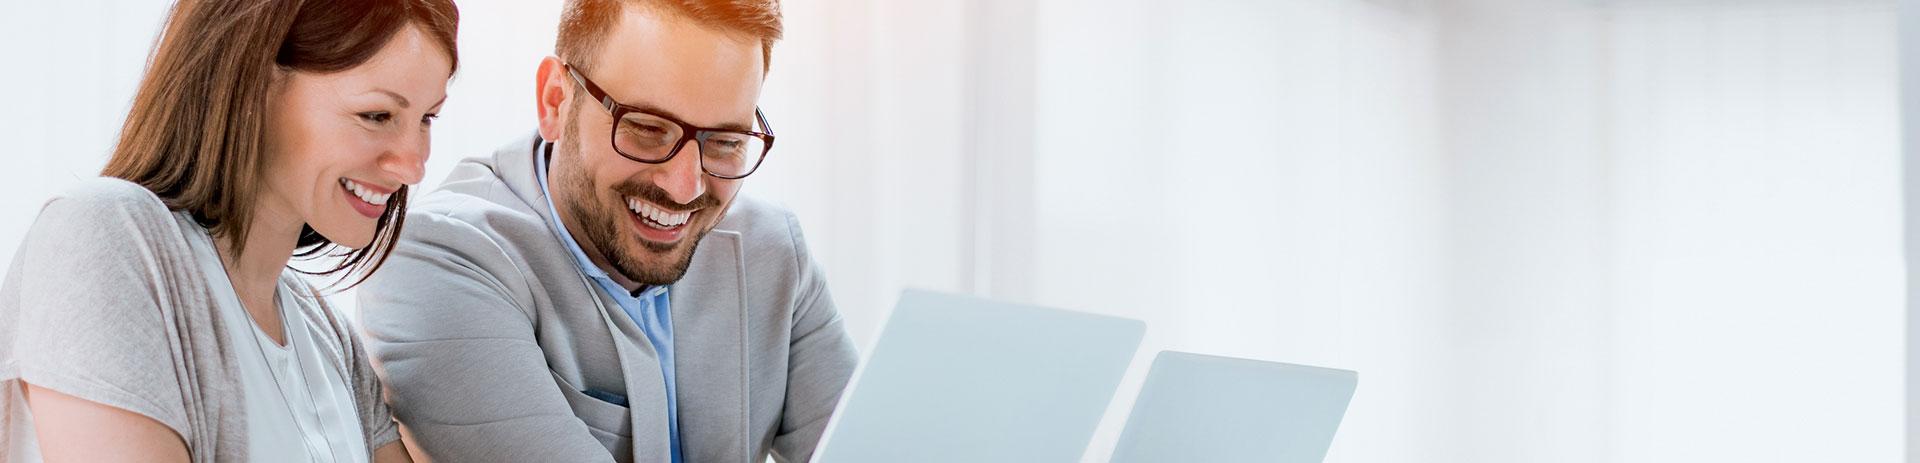 Geschäftsleute sitzen an Besprechungstisch vor Computer